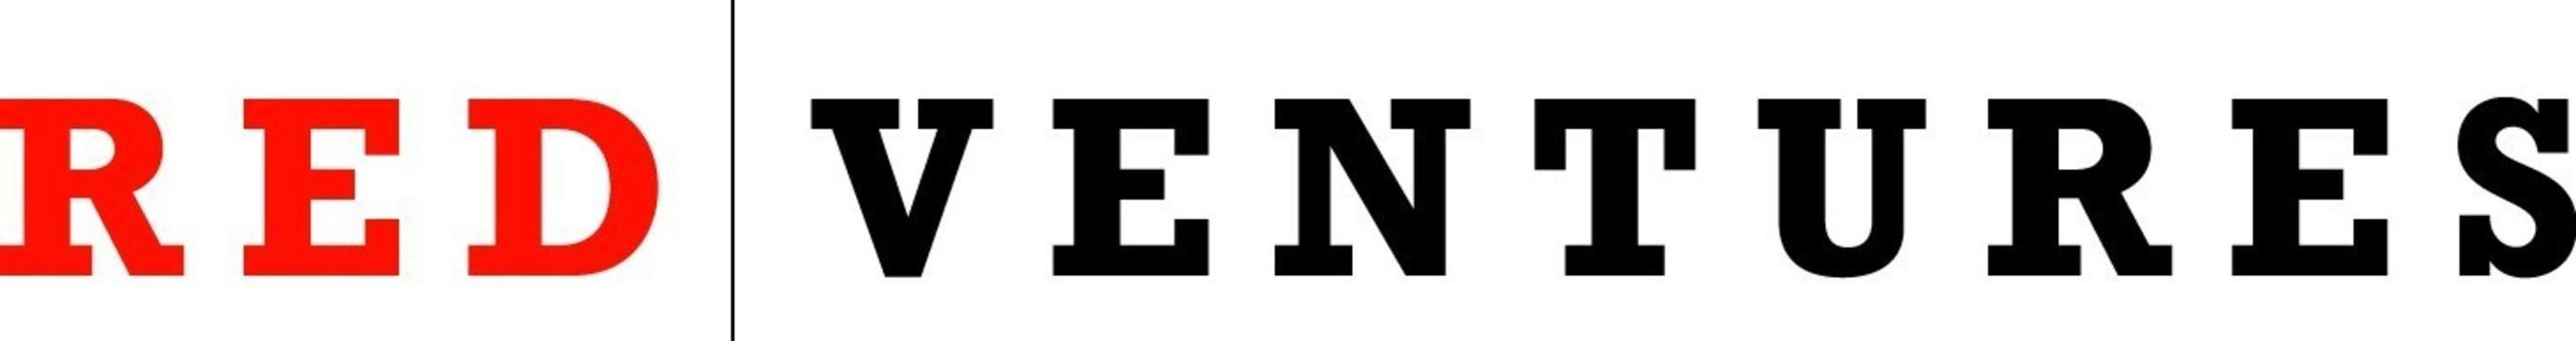 Red Ventures company logo